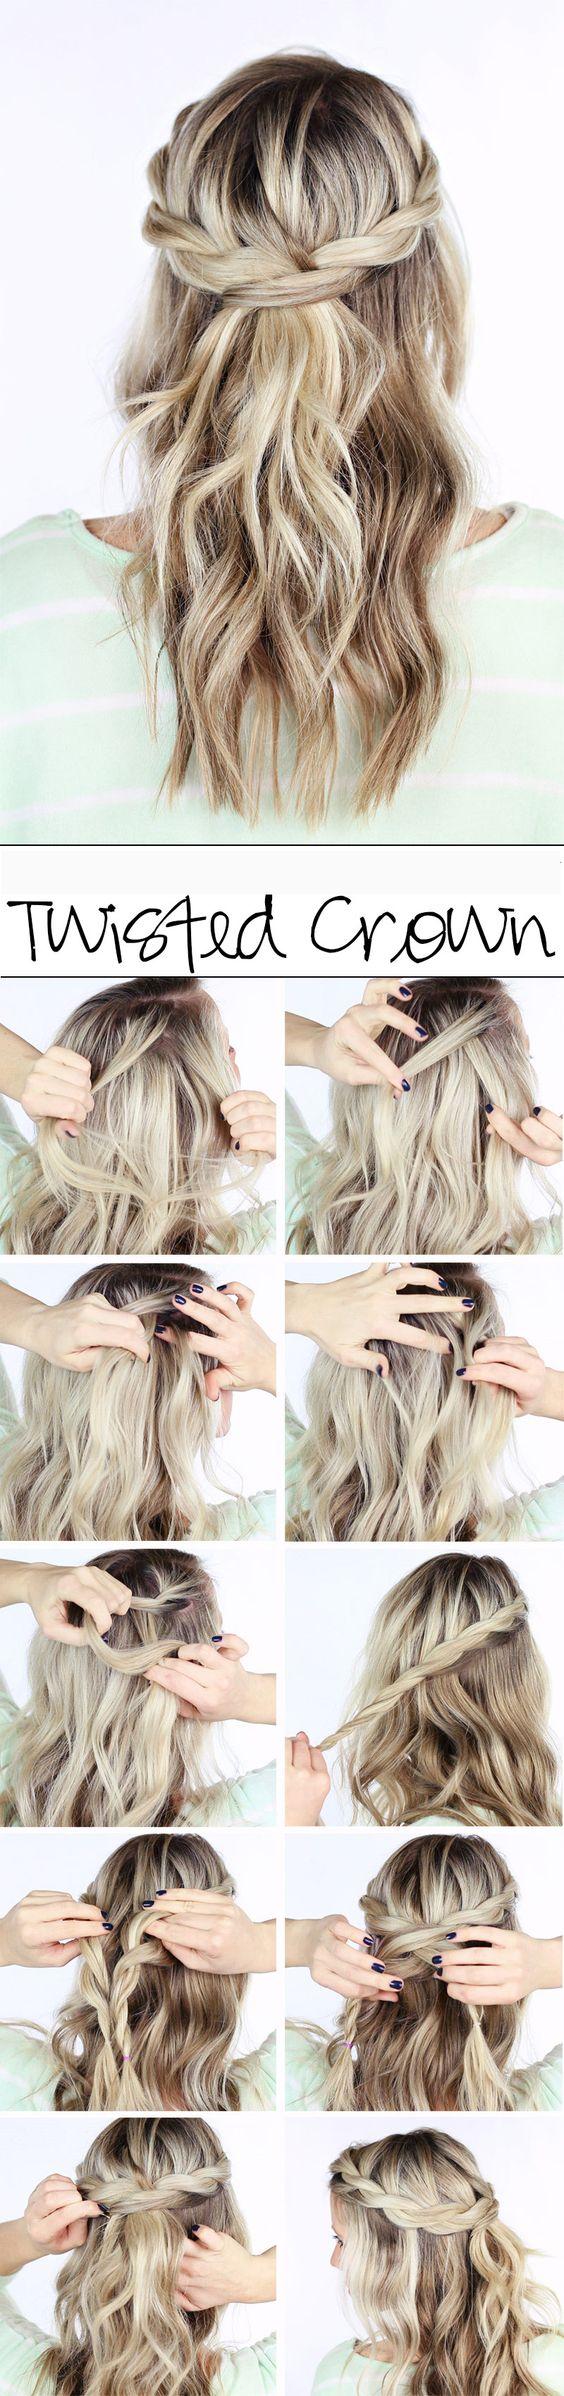 diadema peinados